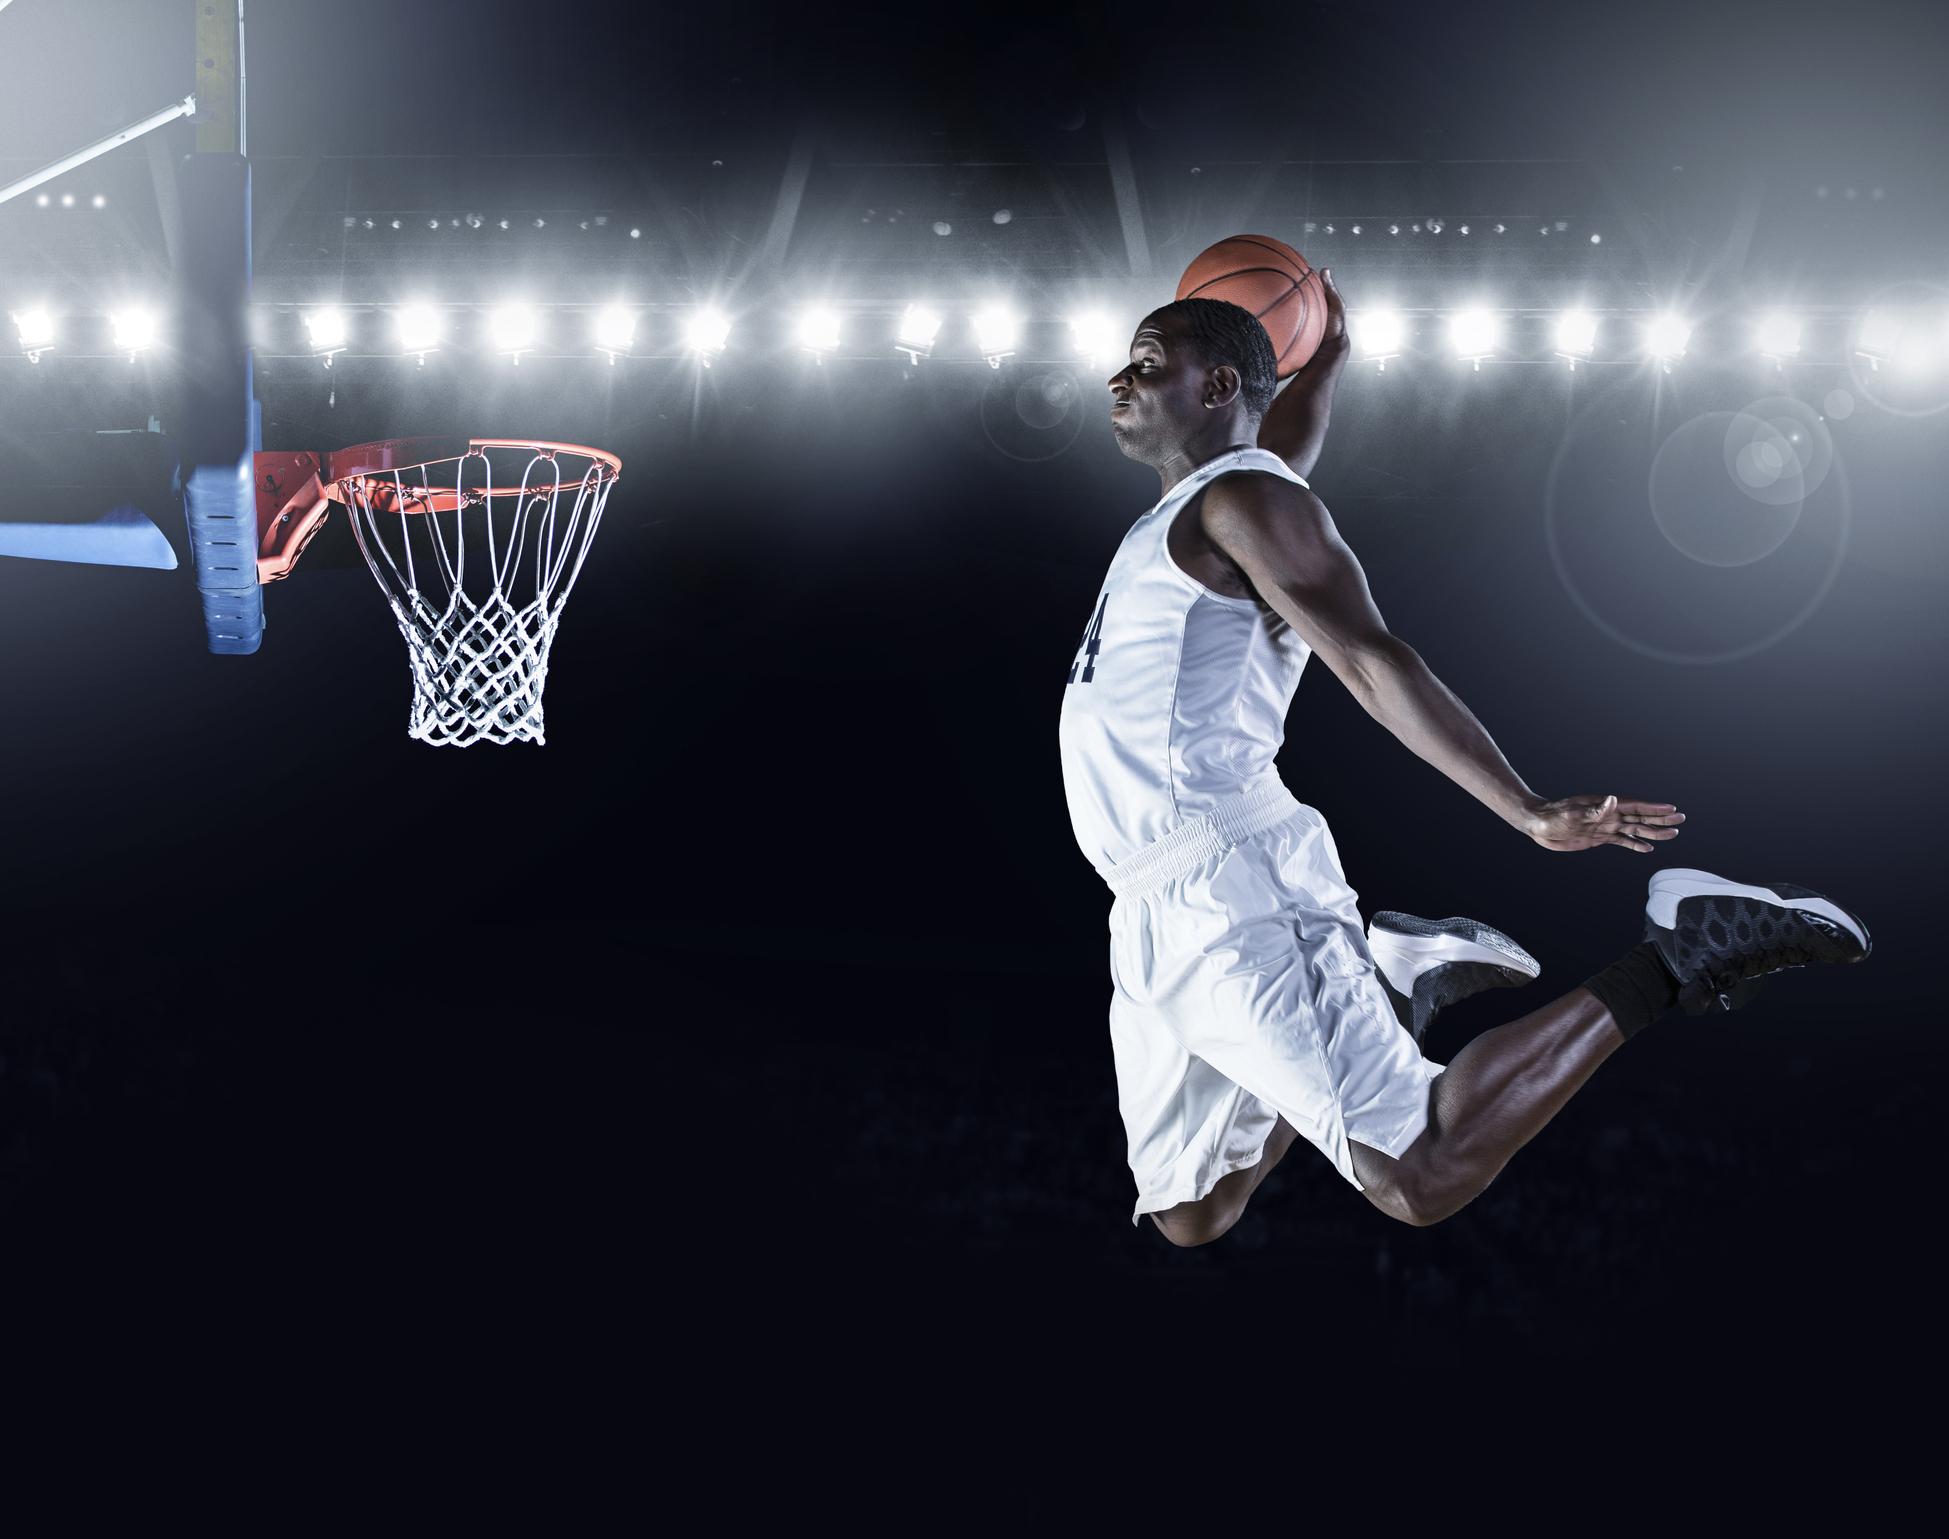 Basketball player flying through air to make a slam dunk